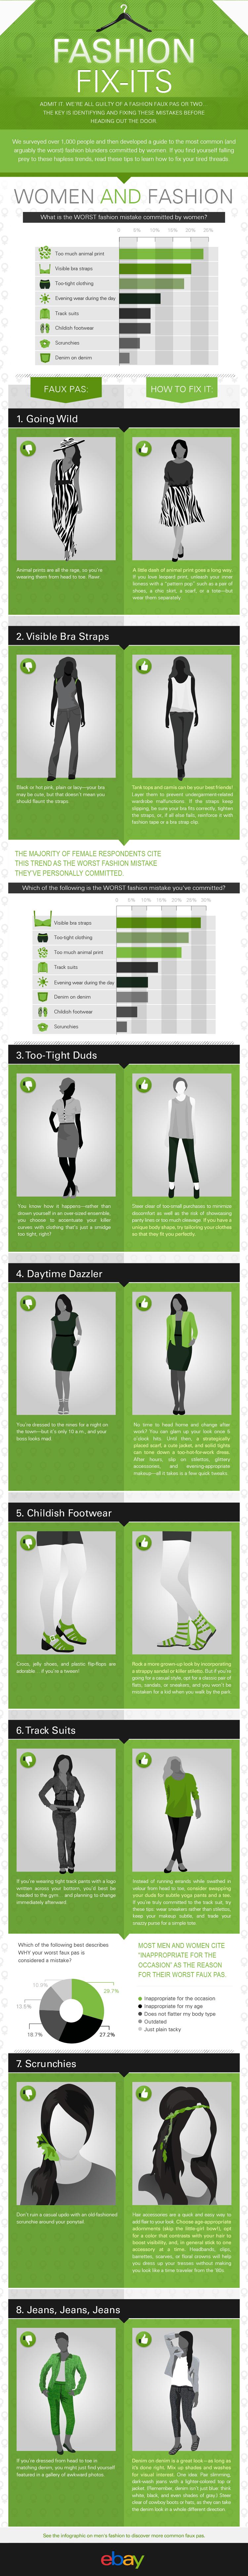 Fashion-Fix-Its-women